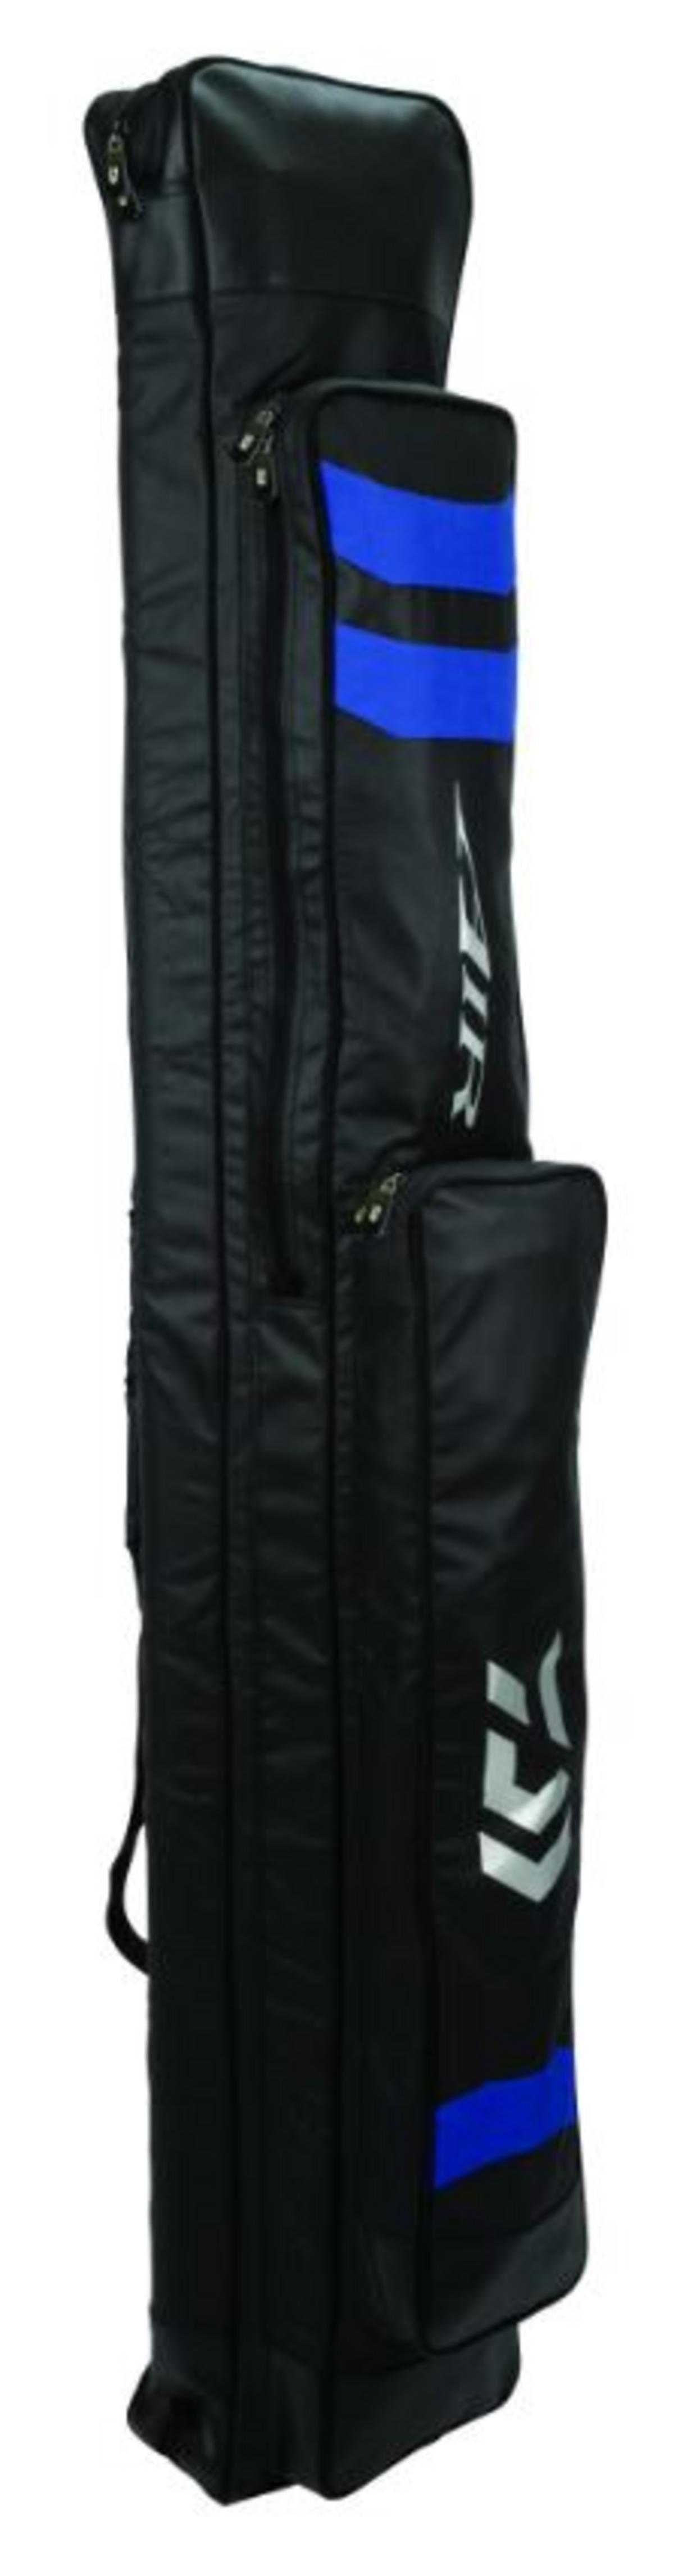 Ex Display Daiwa Air 6 Tube Holdall Luggage Blue/Black AIR6TH-B